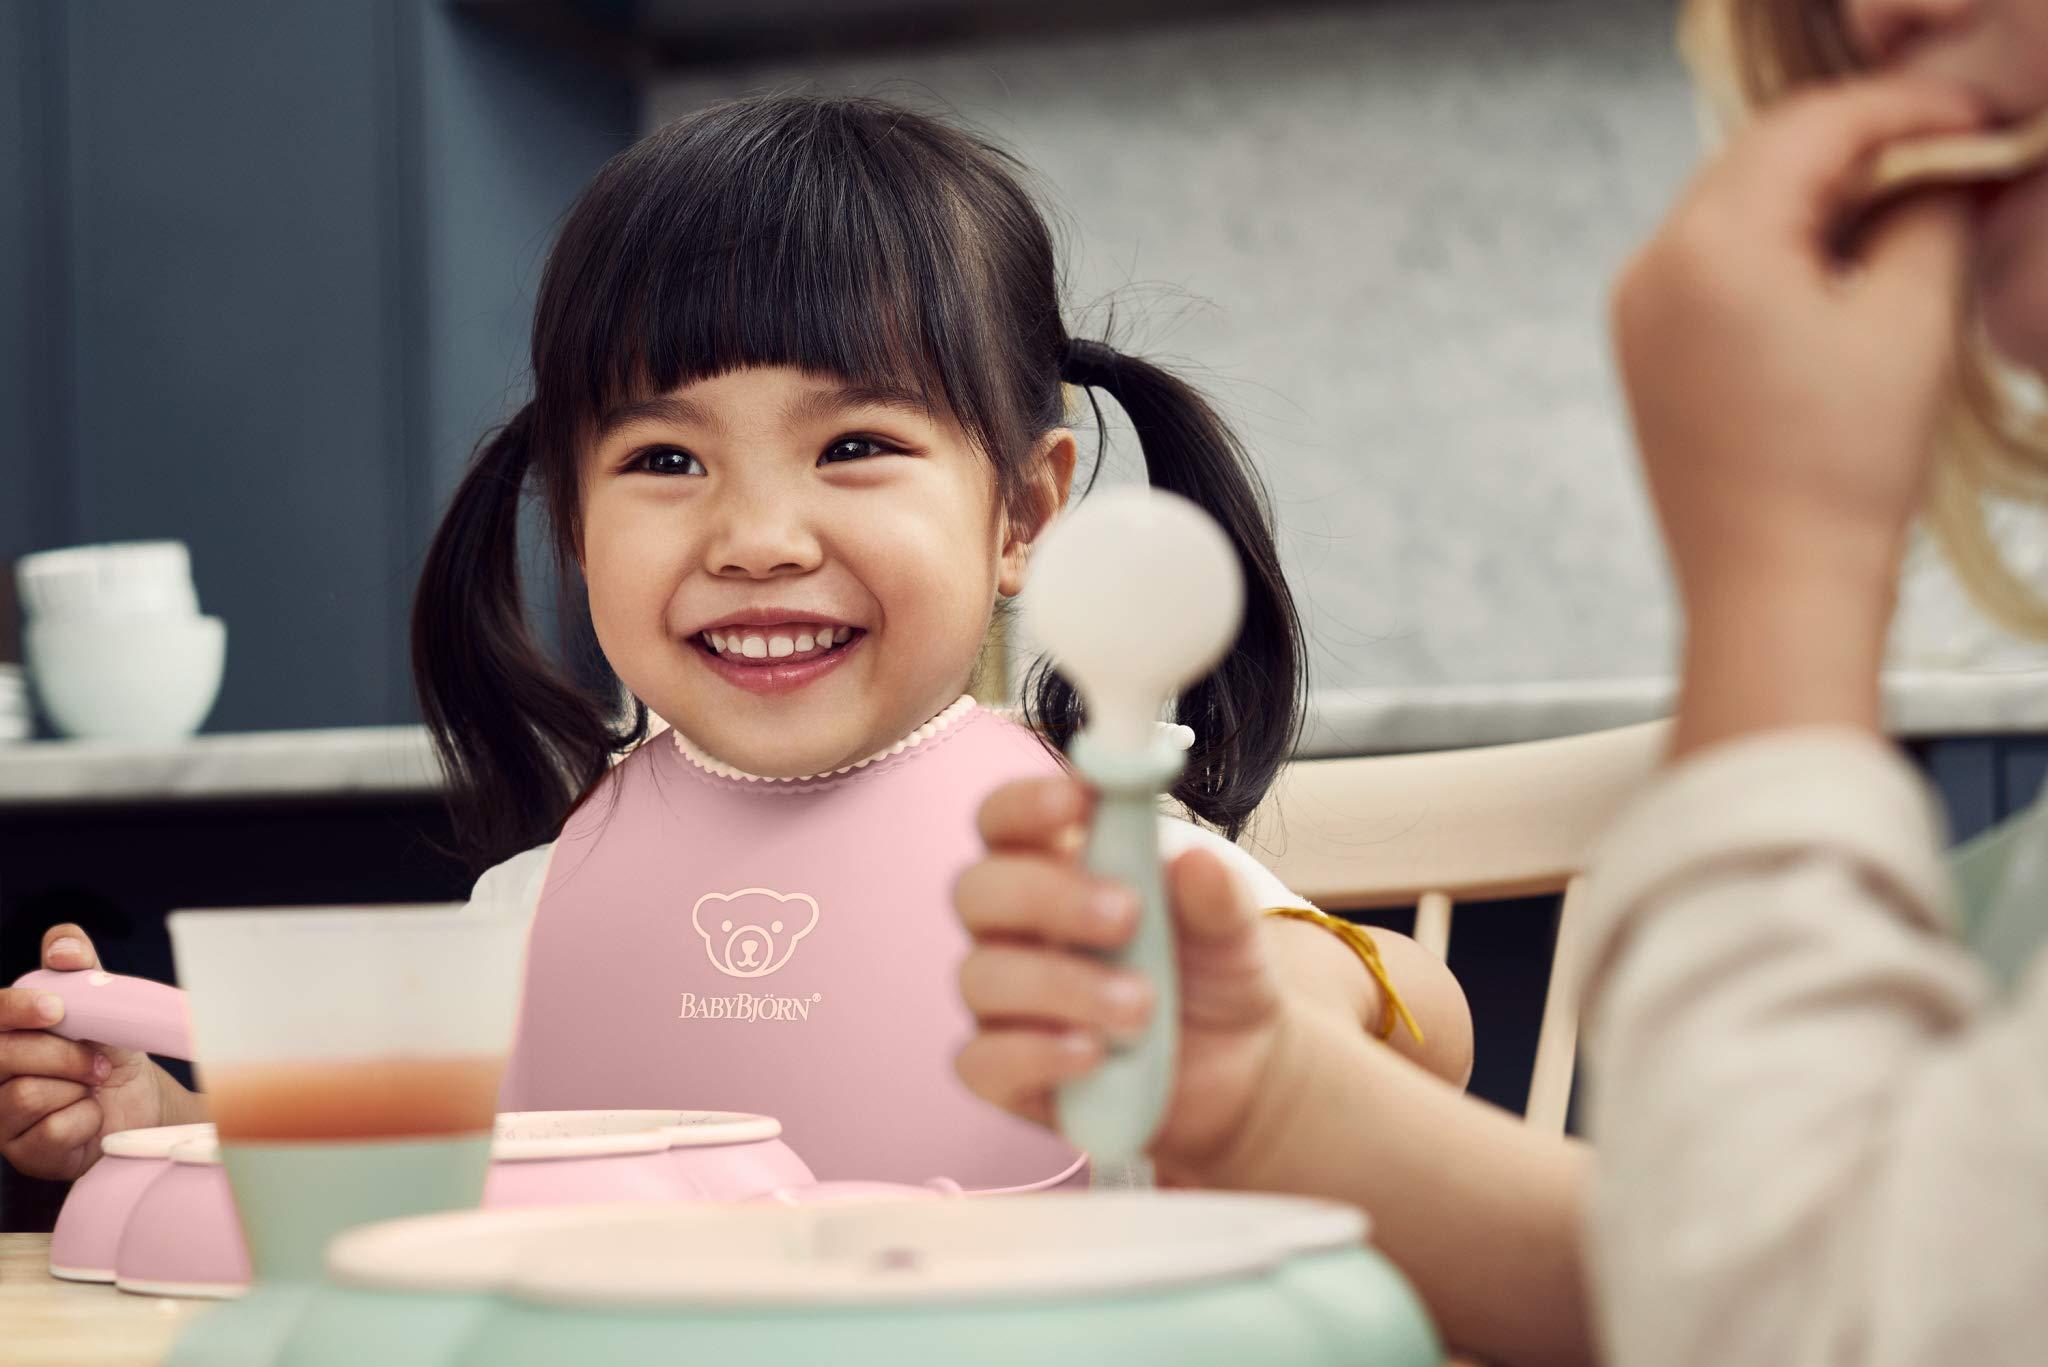 BABYBJORN Baby Dinner Set, Powder Pink by BabyBjörn (Image #7)